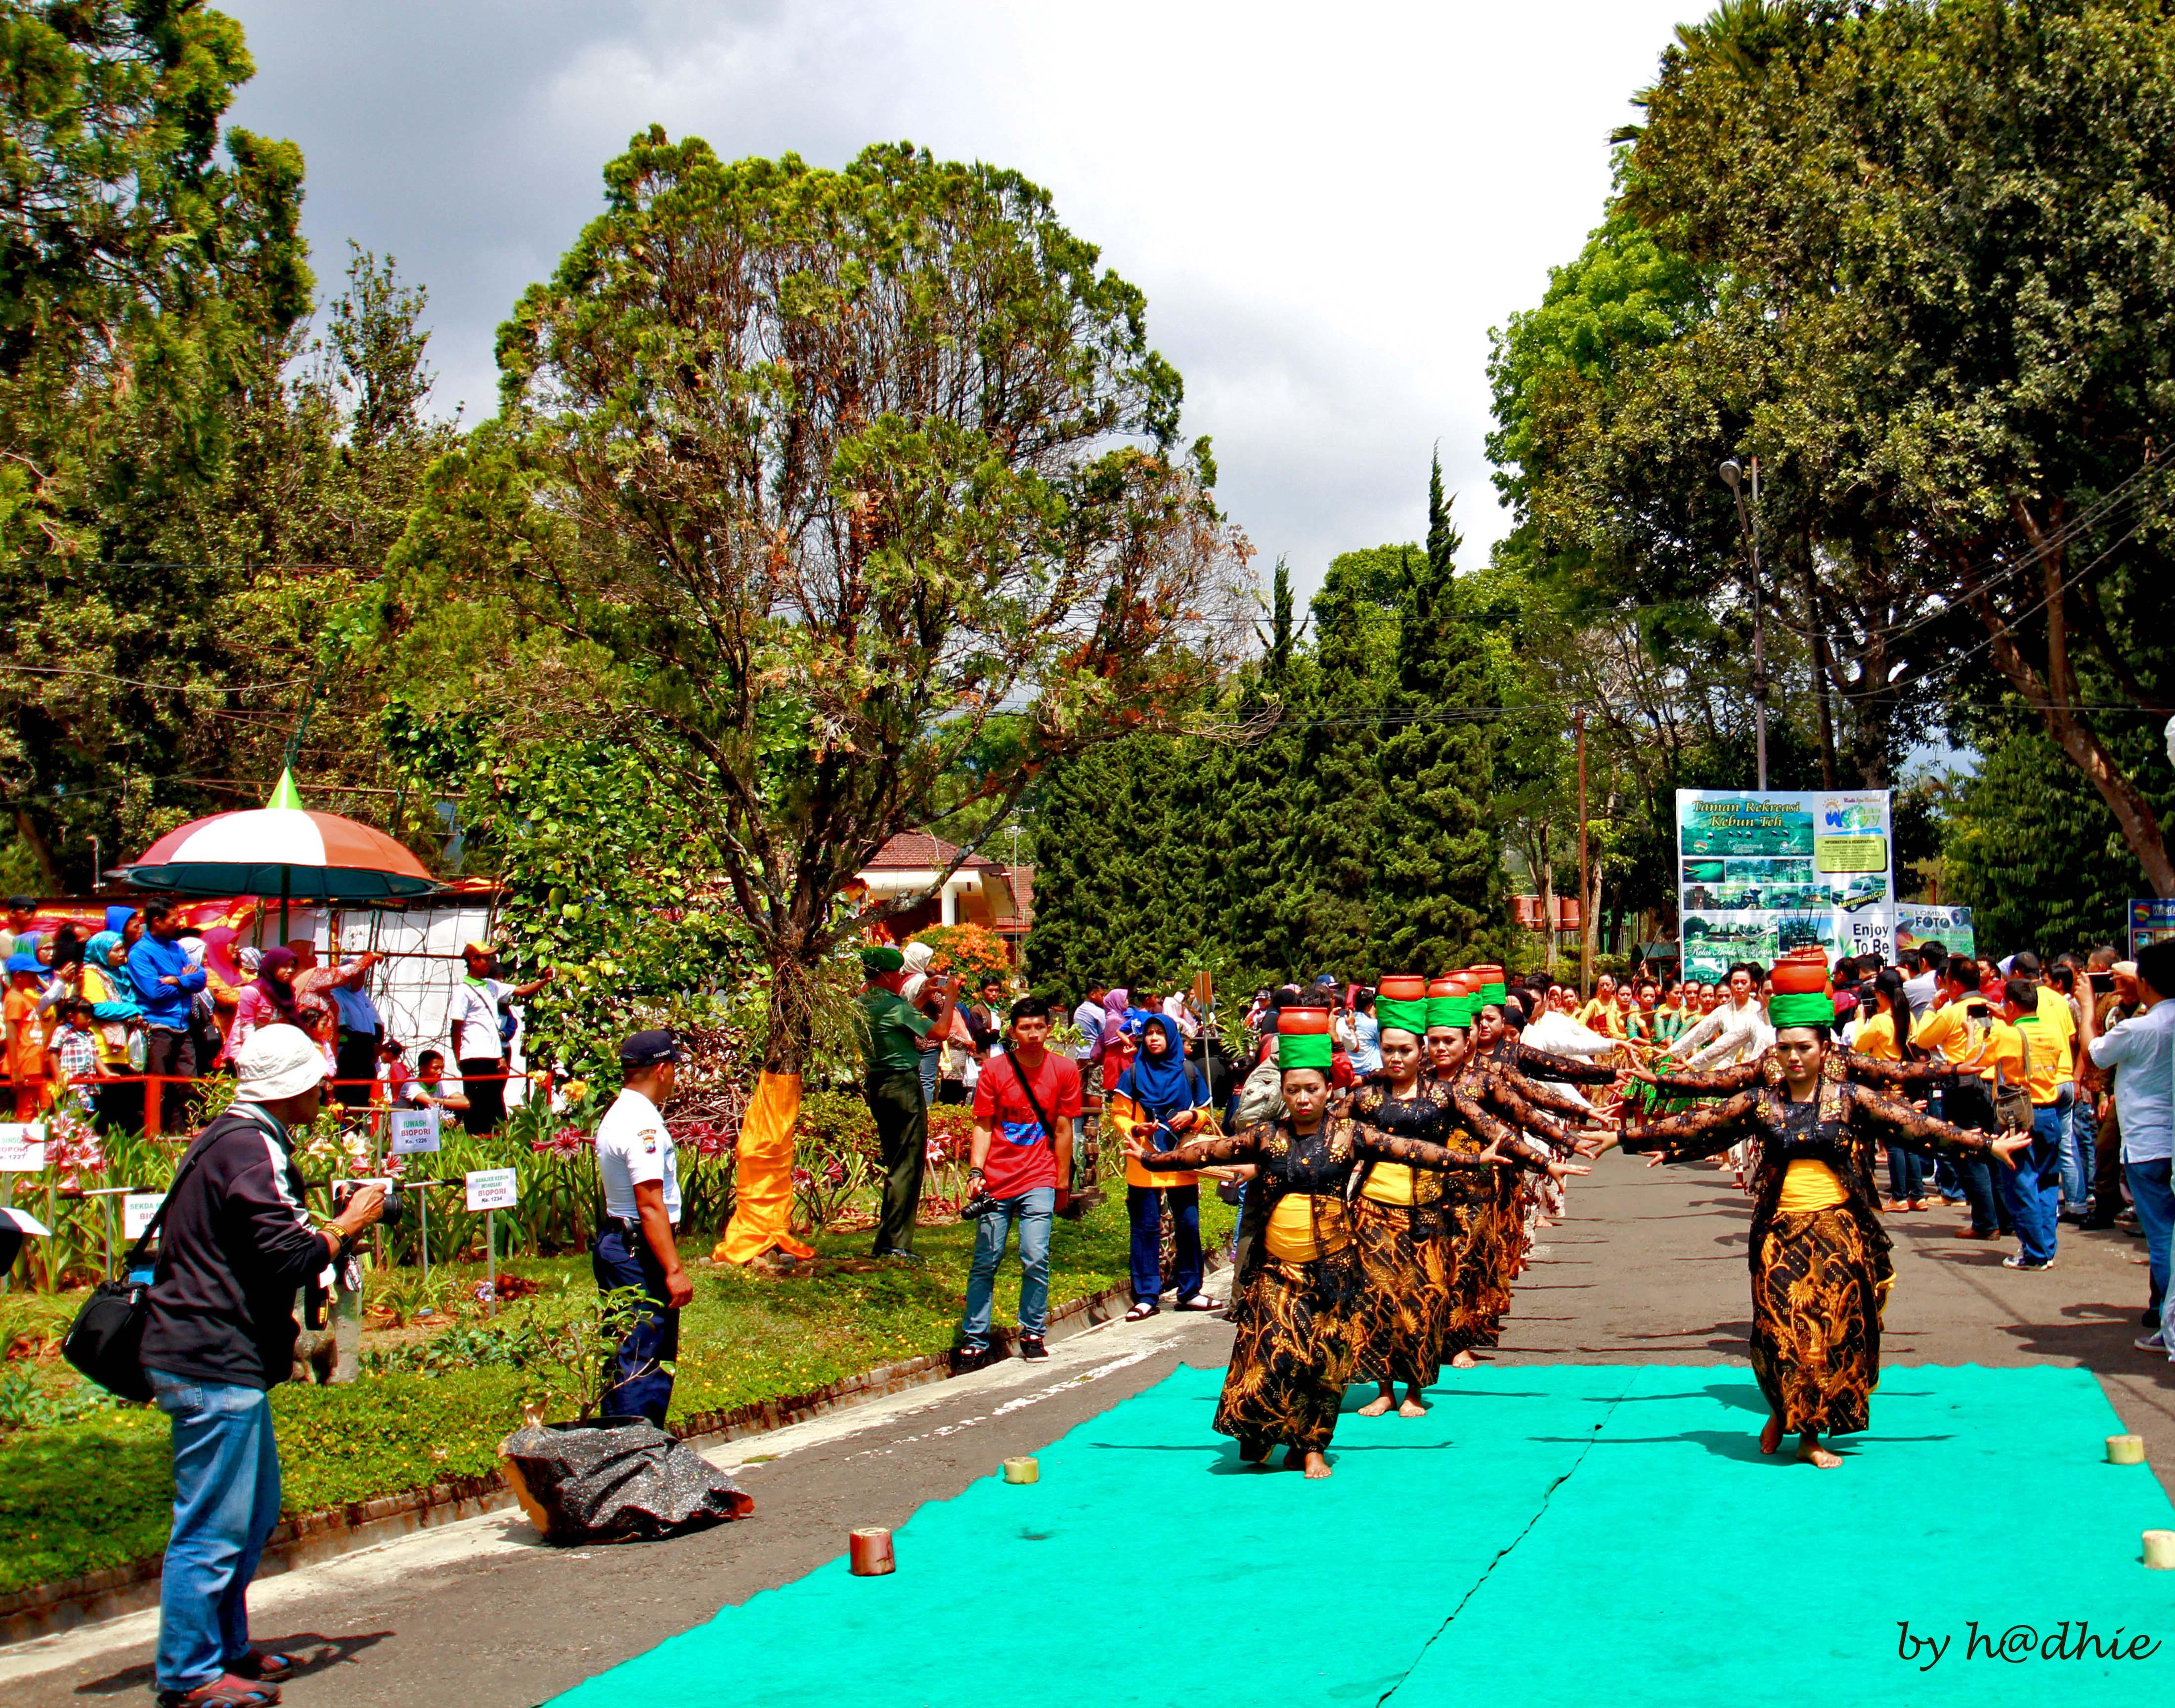 1 Wisata Agro Wonosari Lawang Malang Rolas Img 0200 Mix